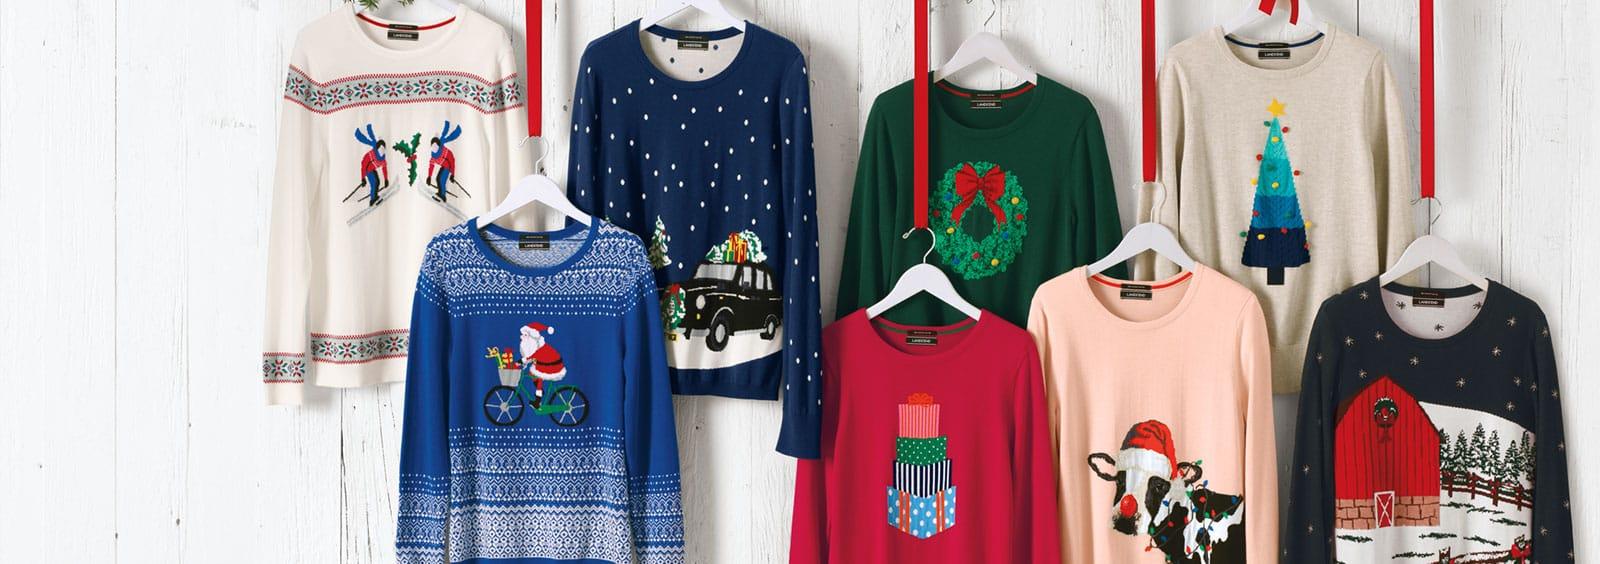 Ten favorite Christmas sweaters